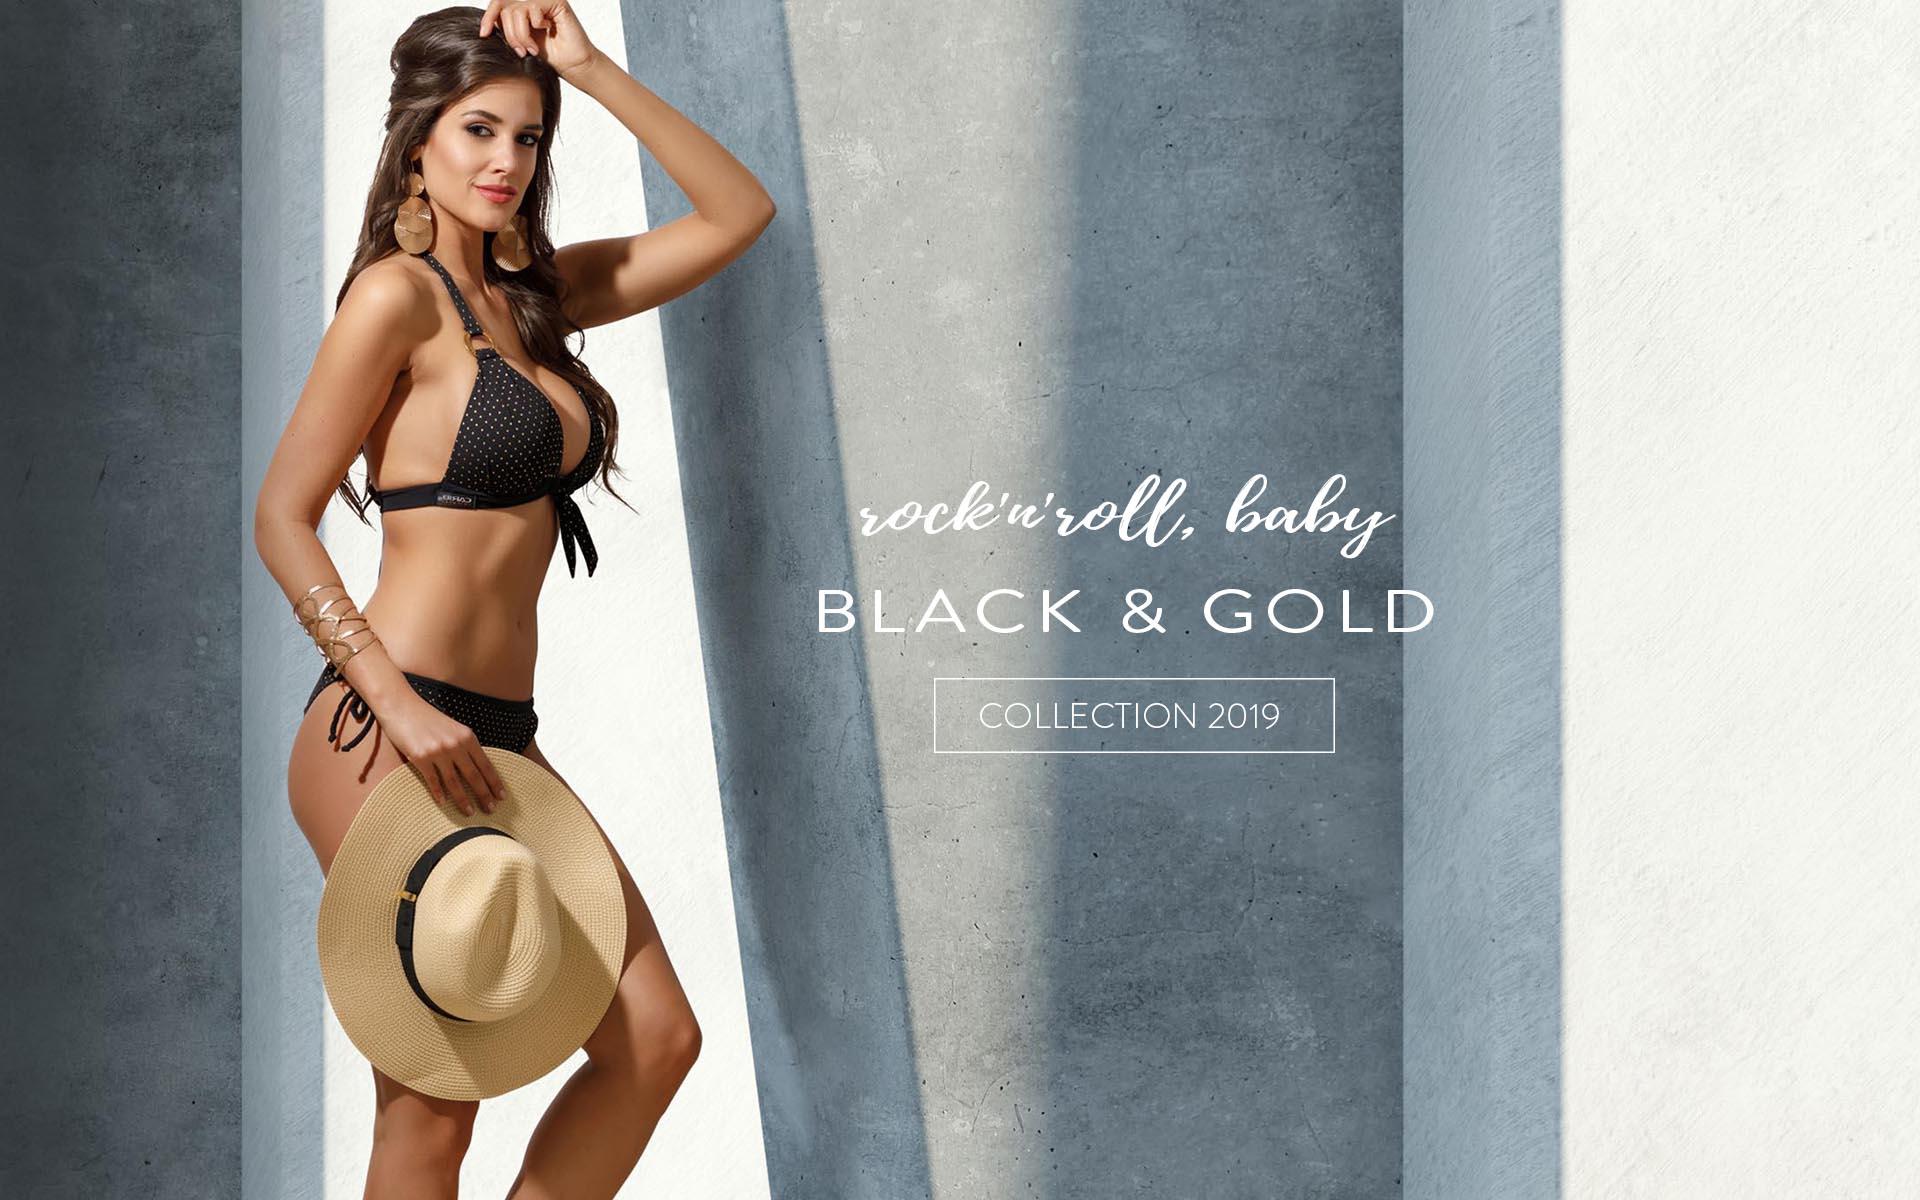 carib-furdoruha-bikini-2019-kollekcio-web-2n